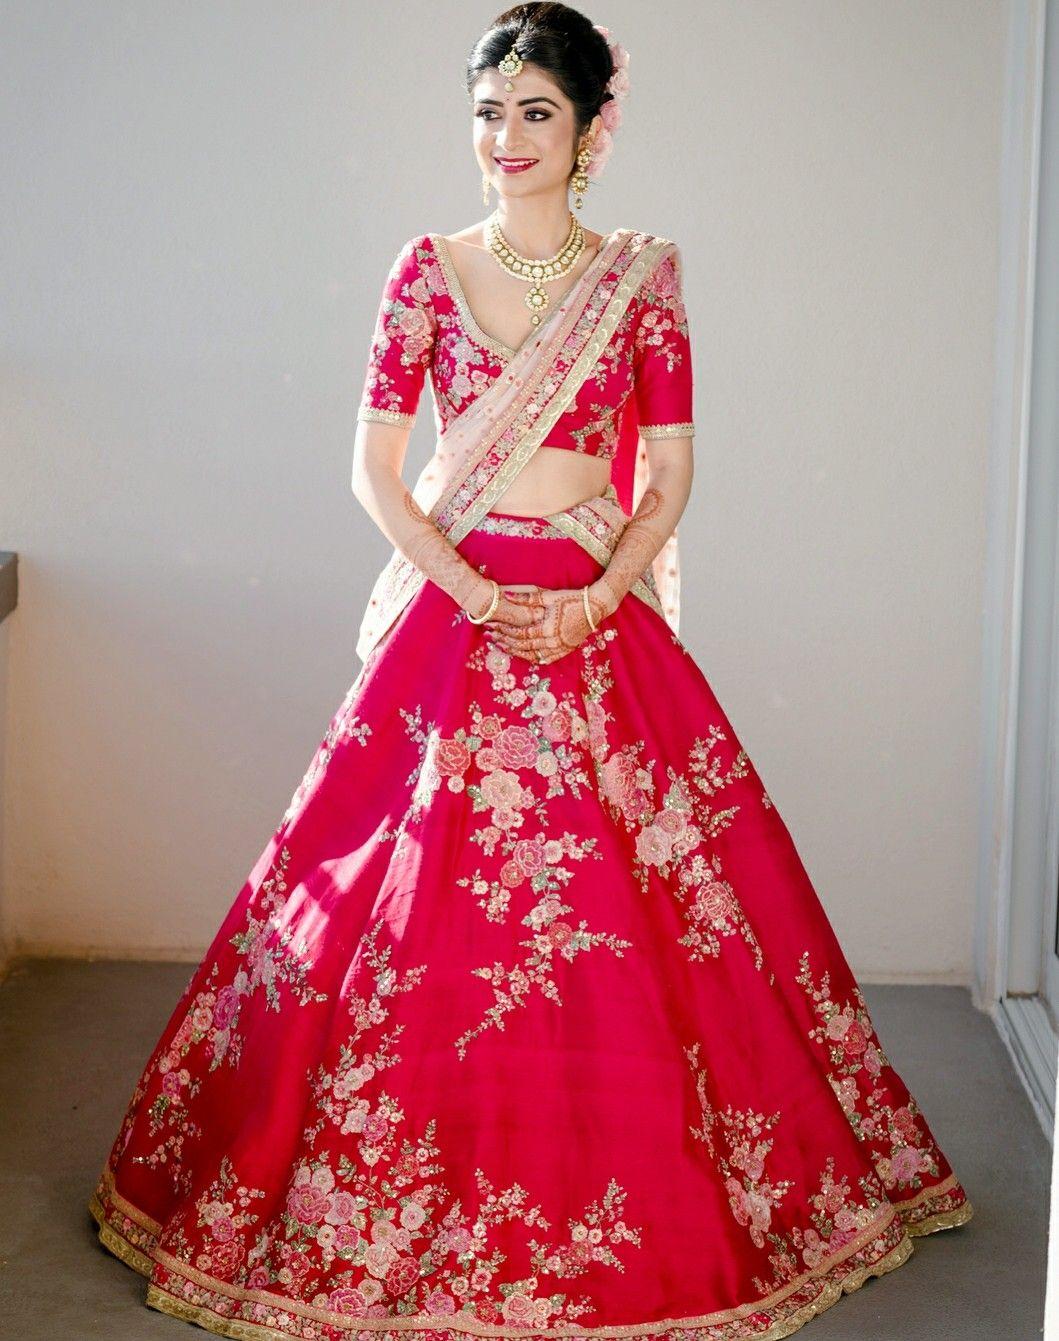 Traditional tunisian wedding dress  Pin by K Patel on Indian designer wear  Pinterest  Indian designer